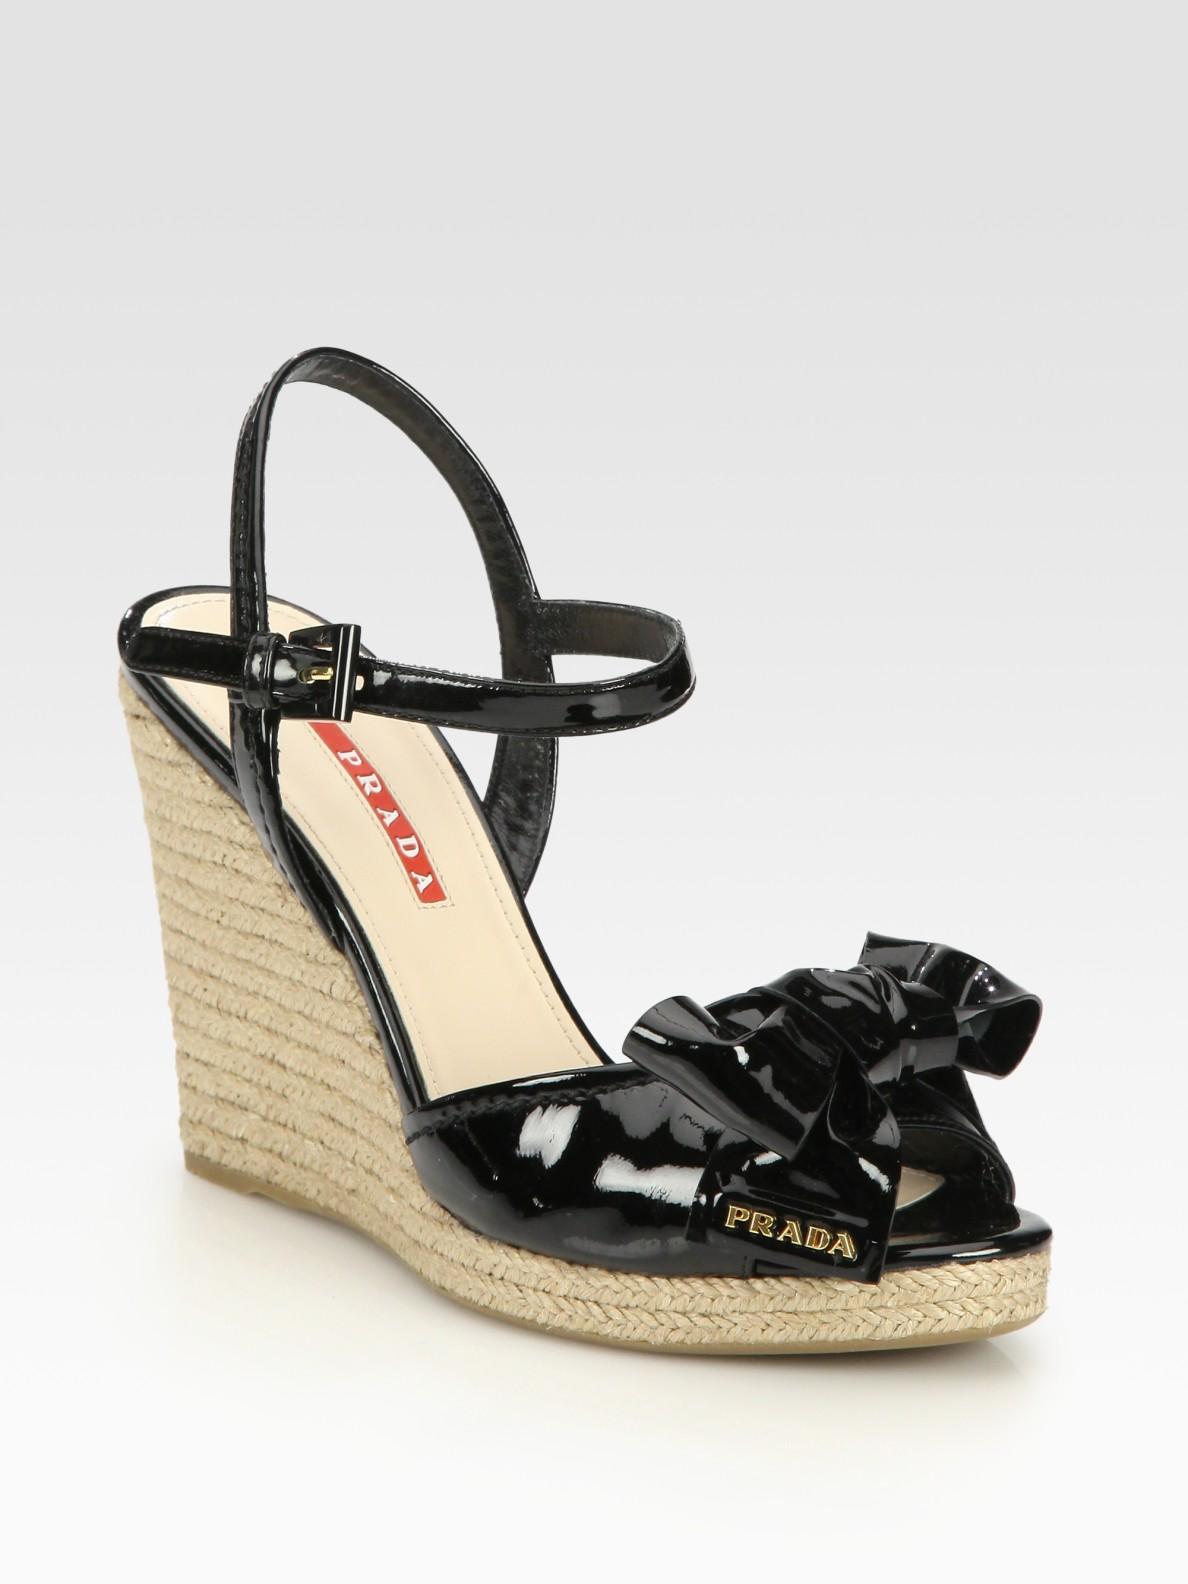 Prada Patent Leather Espadrille Wedge Sandals In Black Lyst